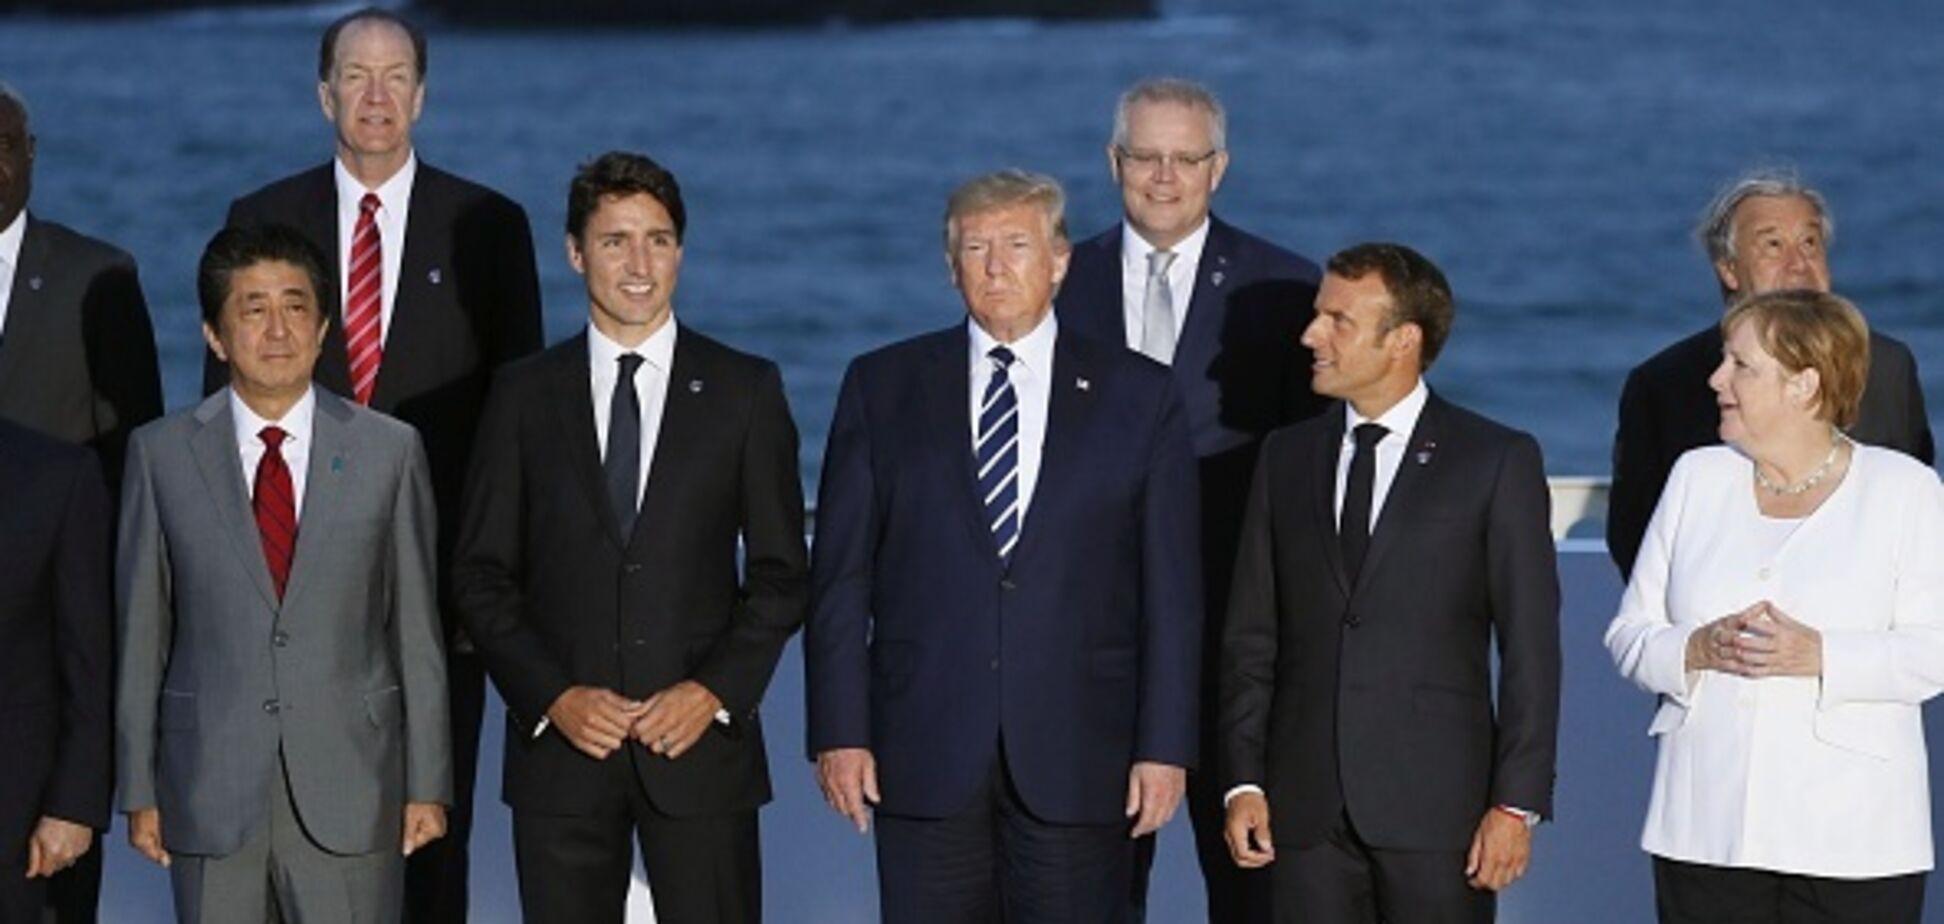 Трамп устроил скандал из-за России на саммите G7 — СМИ